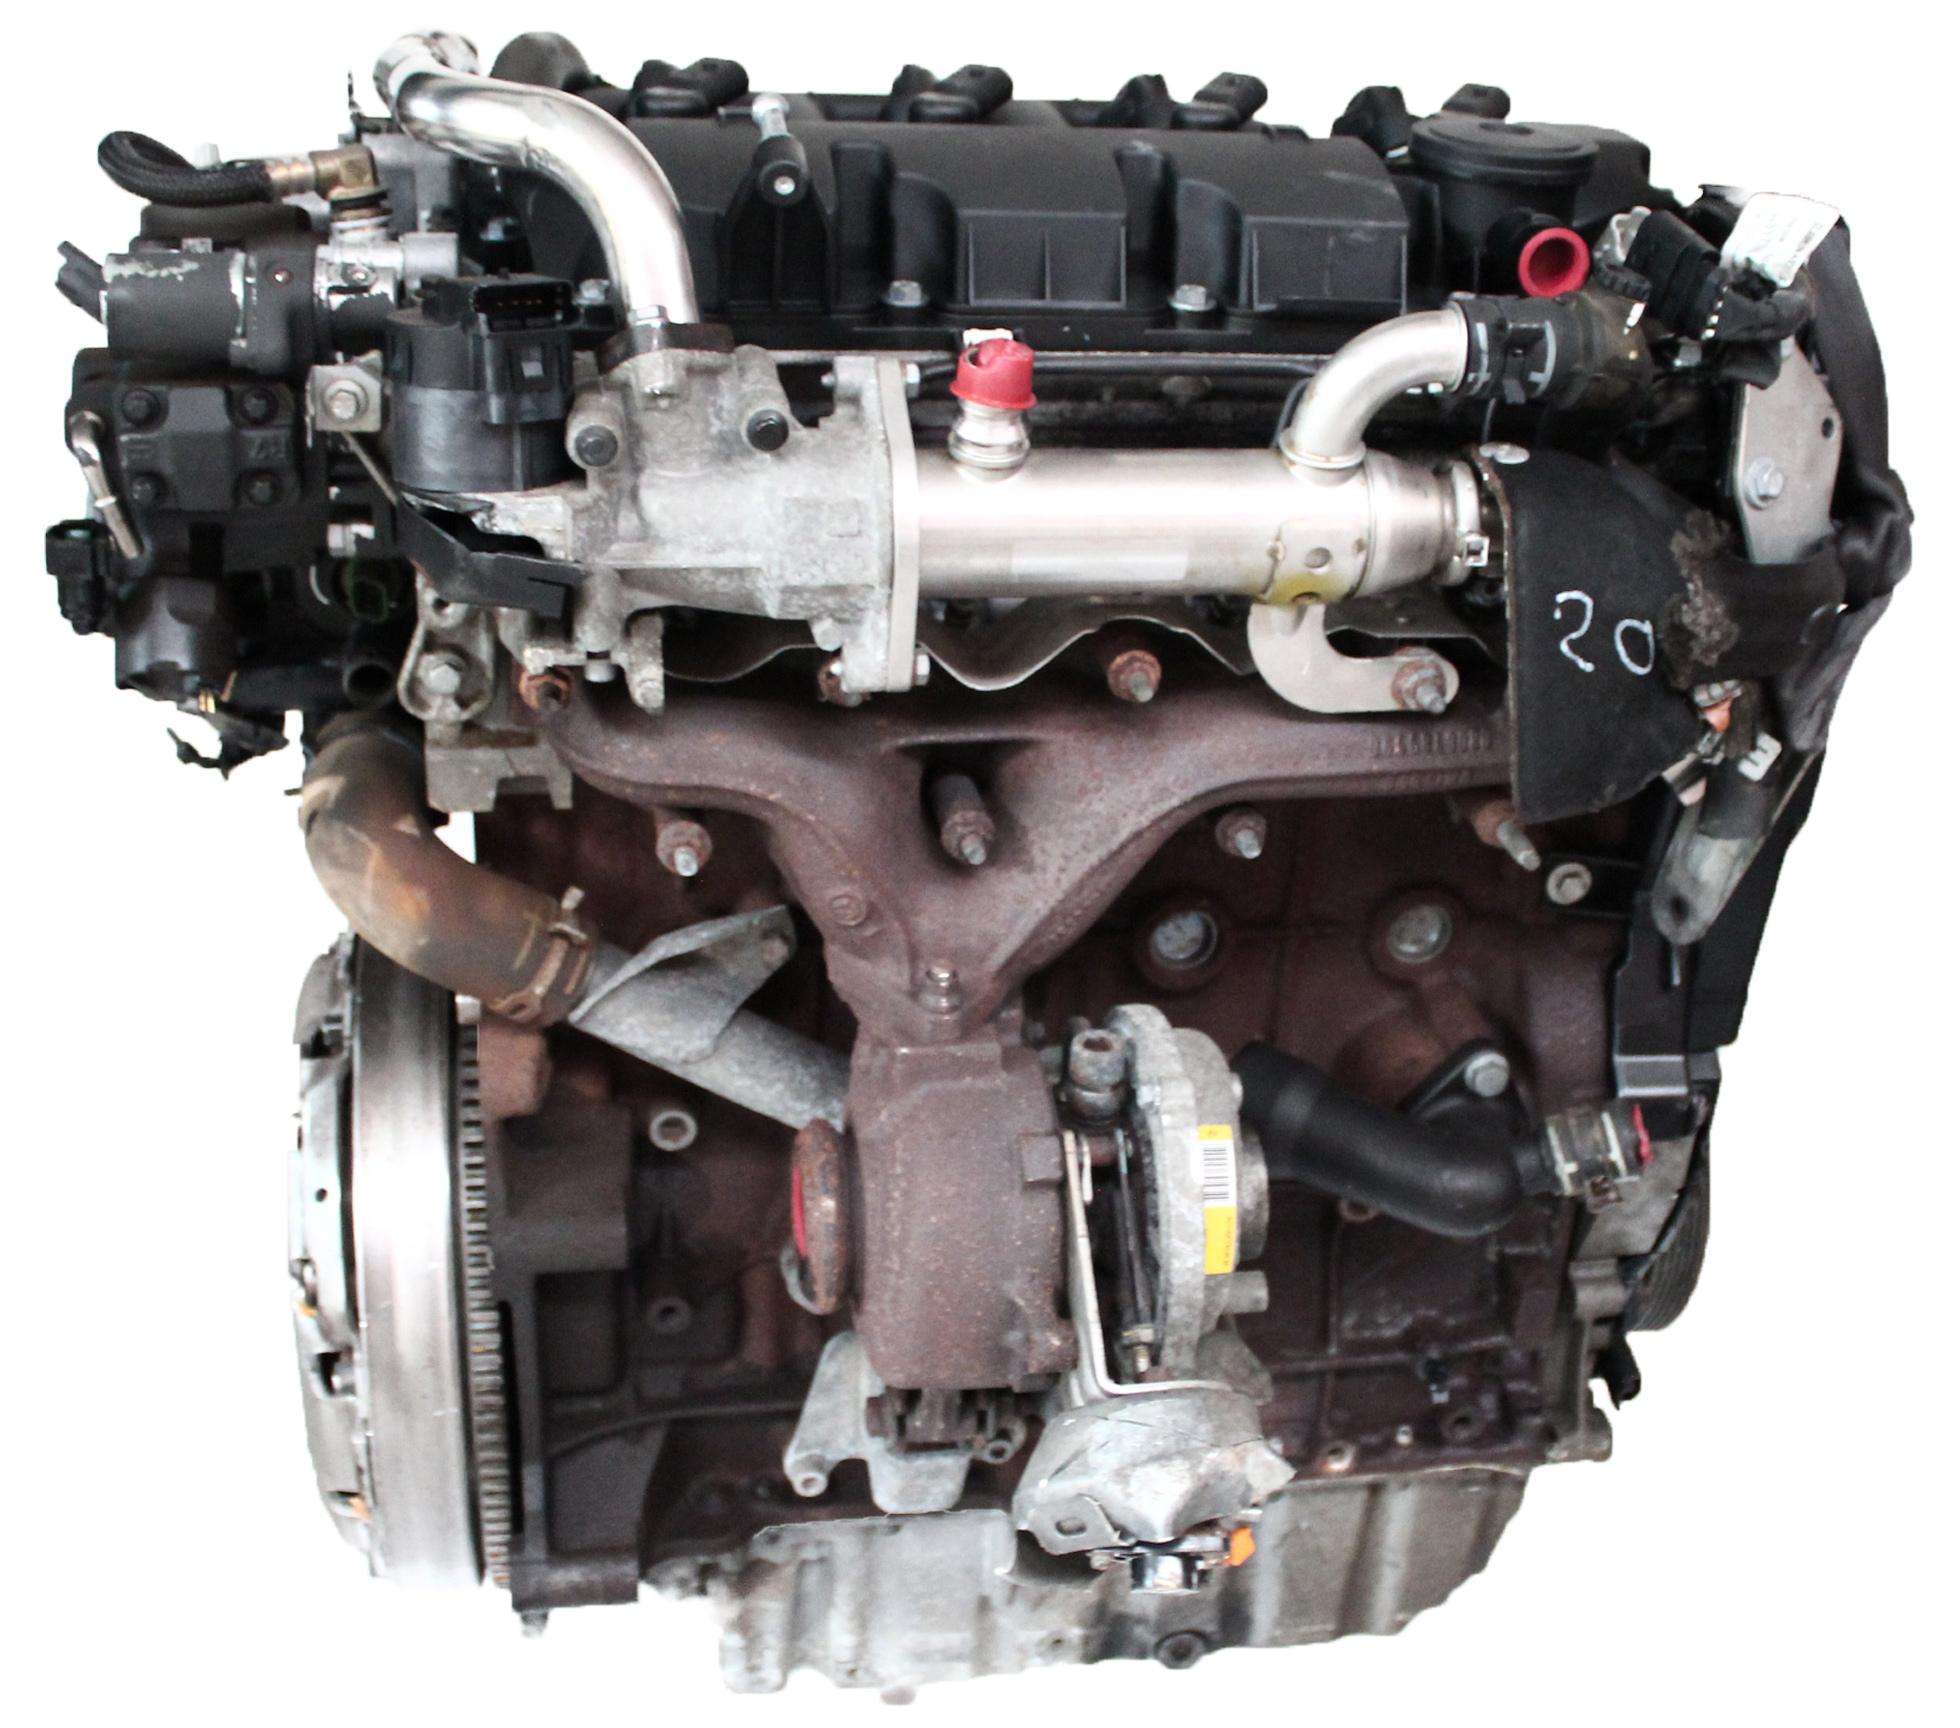 Motor 2007 Ford Mondeo IV BA7 2,0 TDCI Diesel QXBA mit Anbauteilen